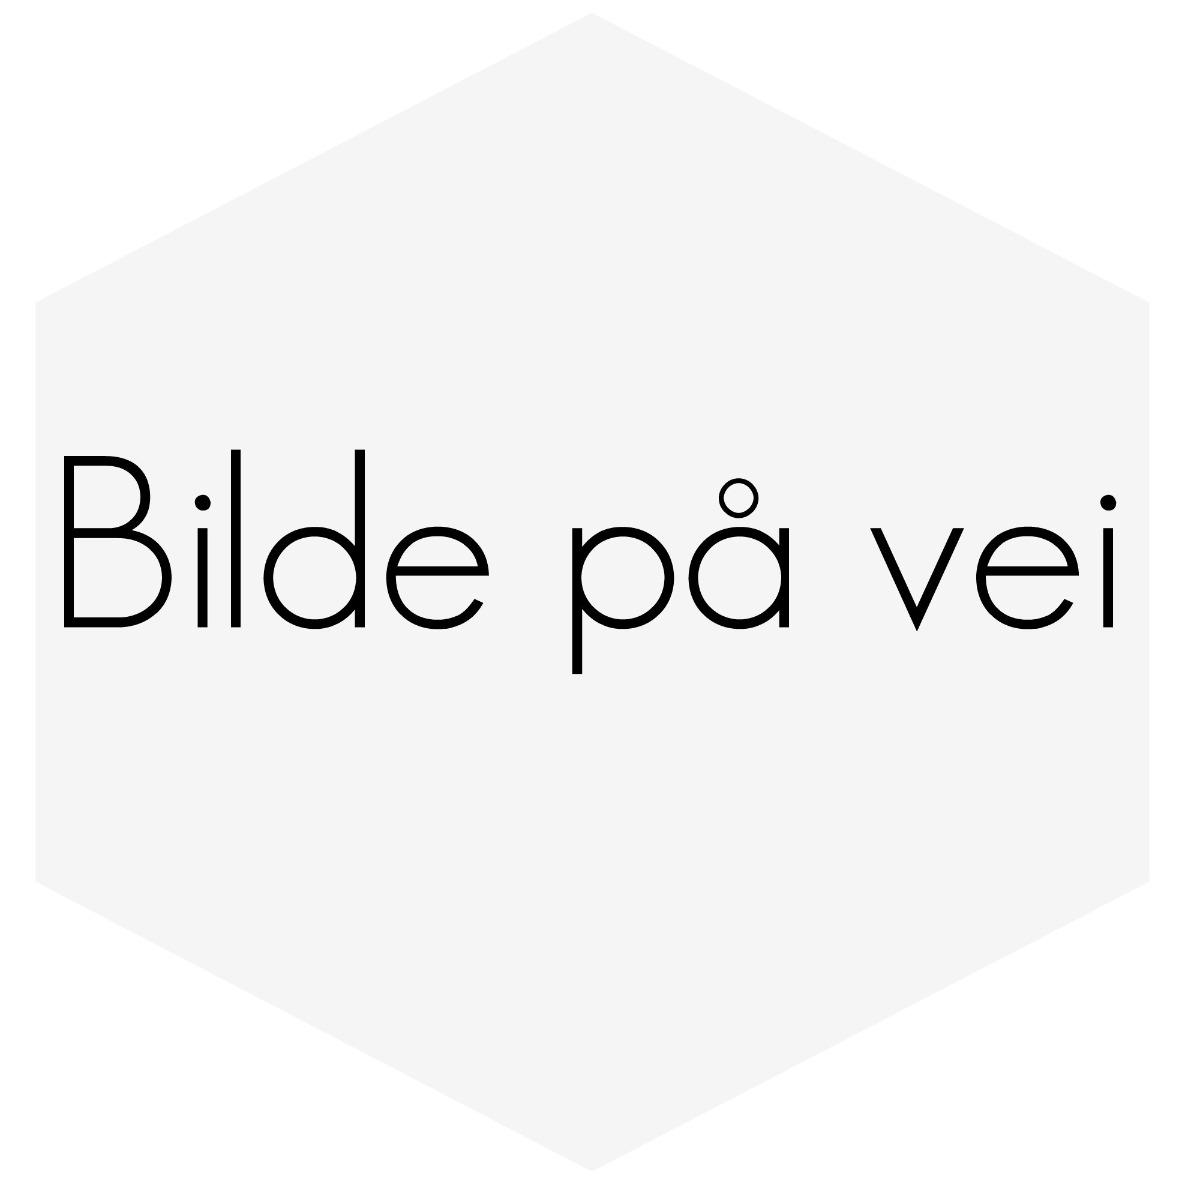 PÆRE TIL INSTRUMENT. NYRERE VOLVO. ORG NR 9148908